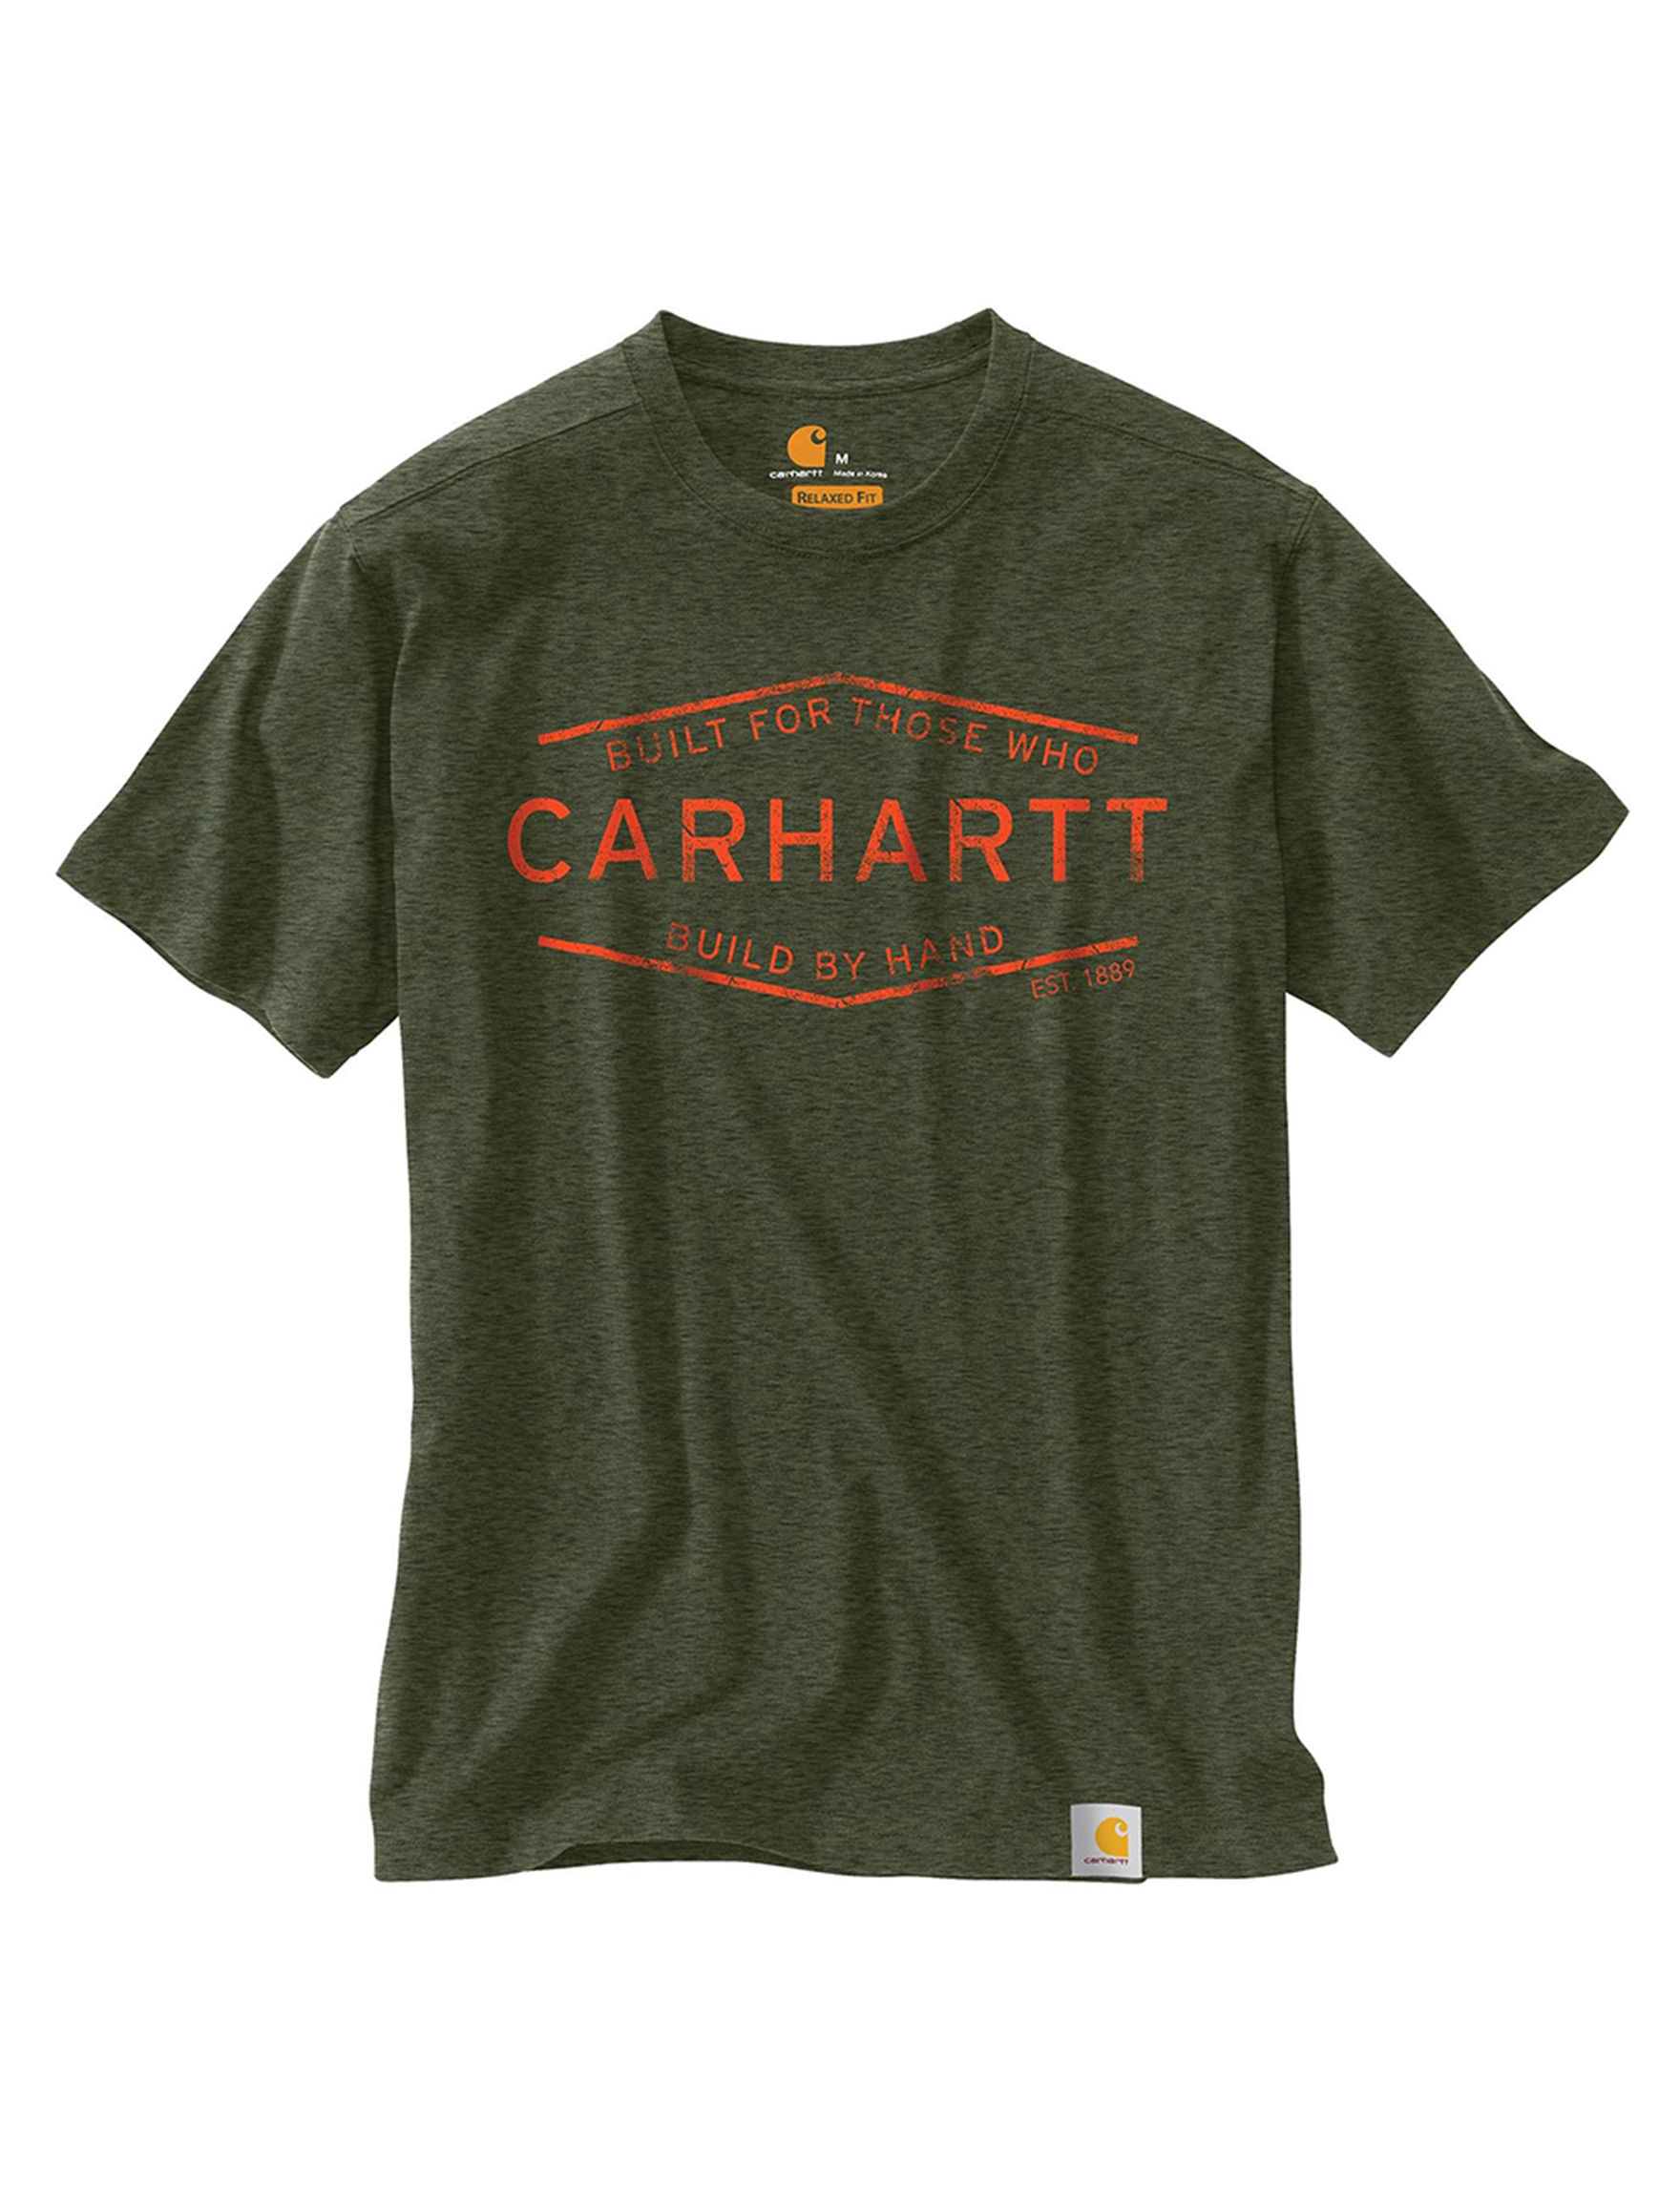 Carhartt Dark Moss Tees & Tanks